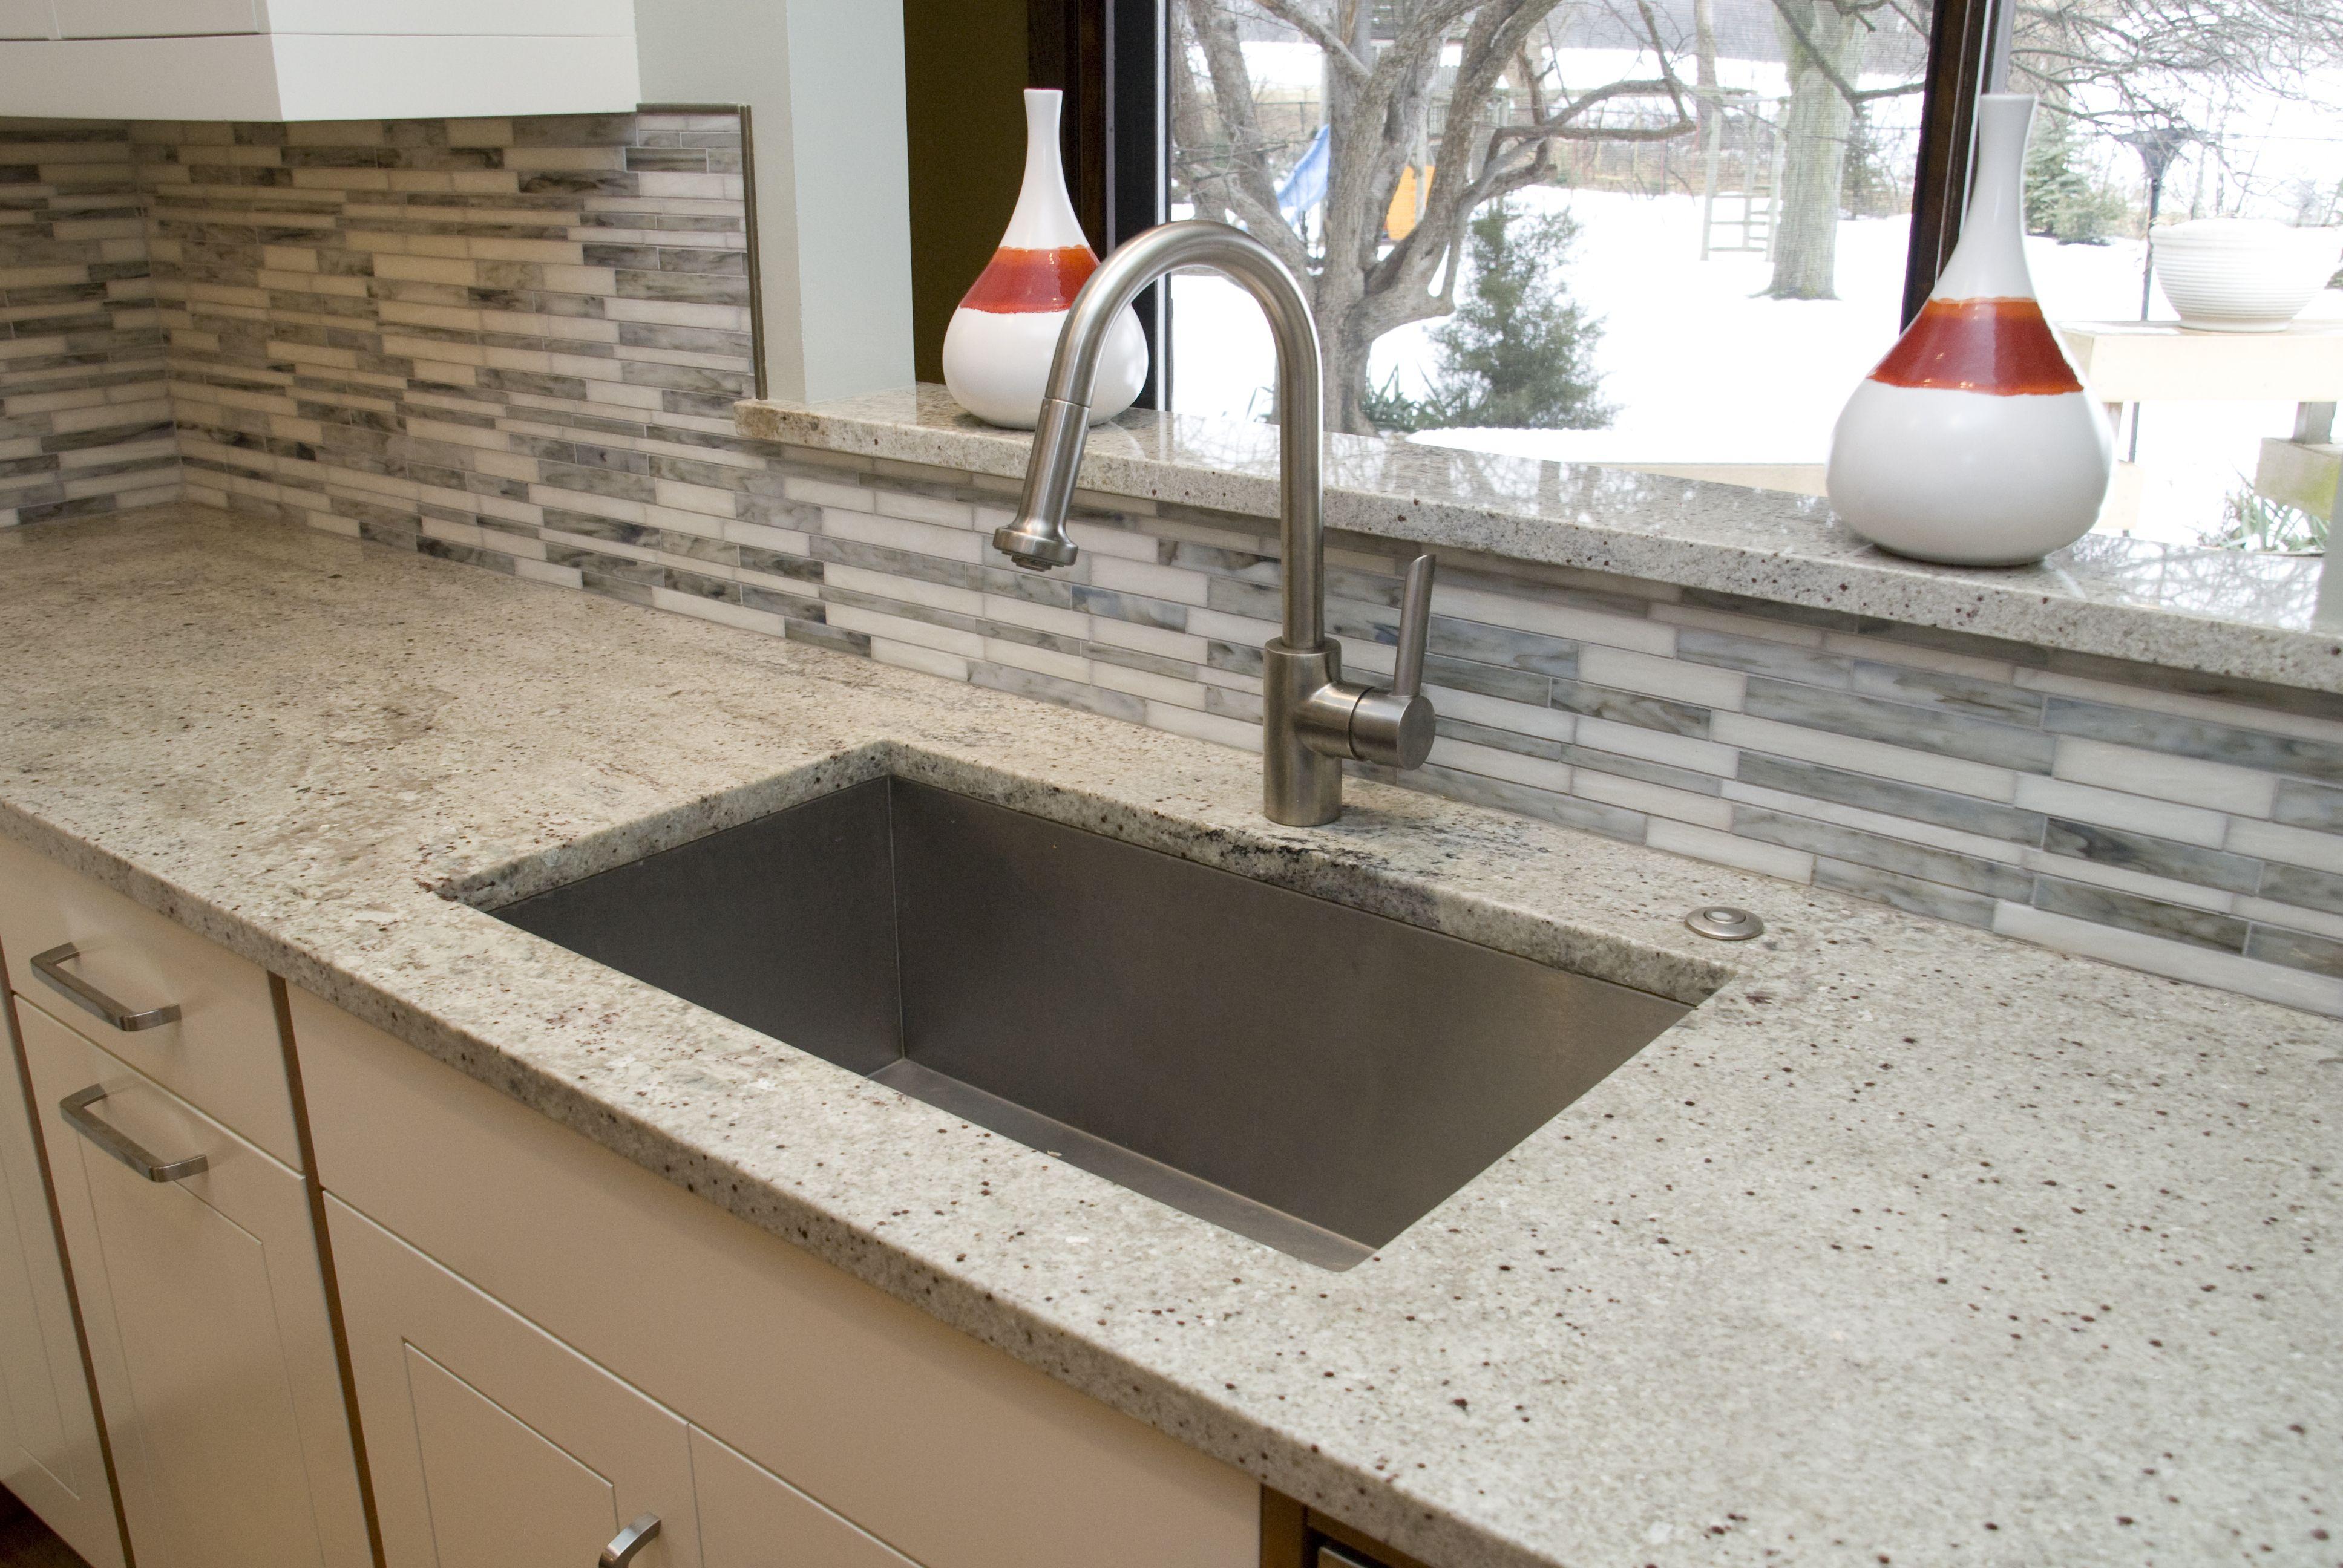 Kitchen window ledge  kitchen love the back splash and sink  kitchens  pinterest